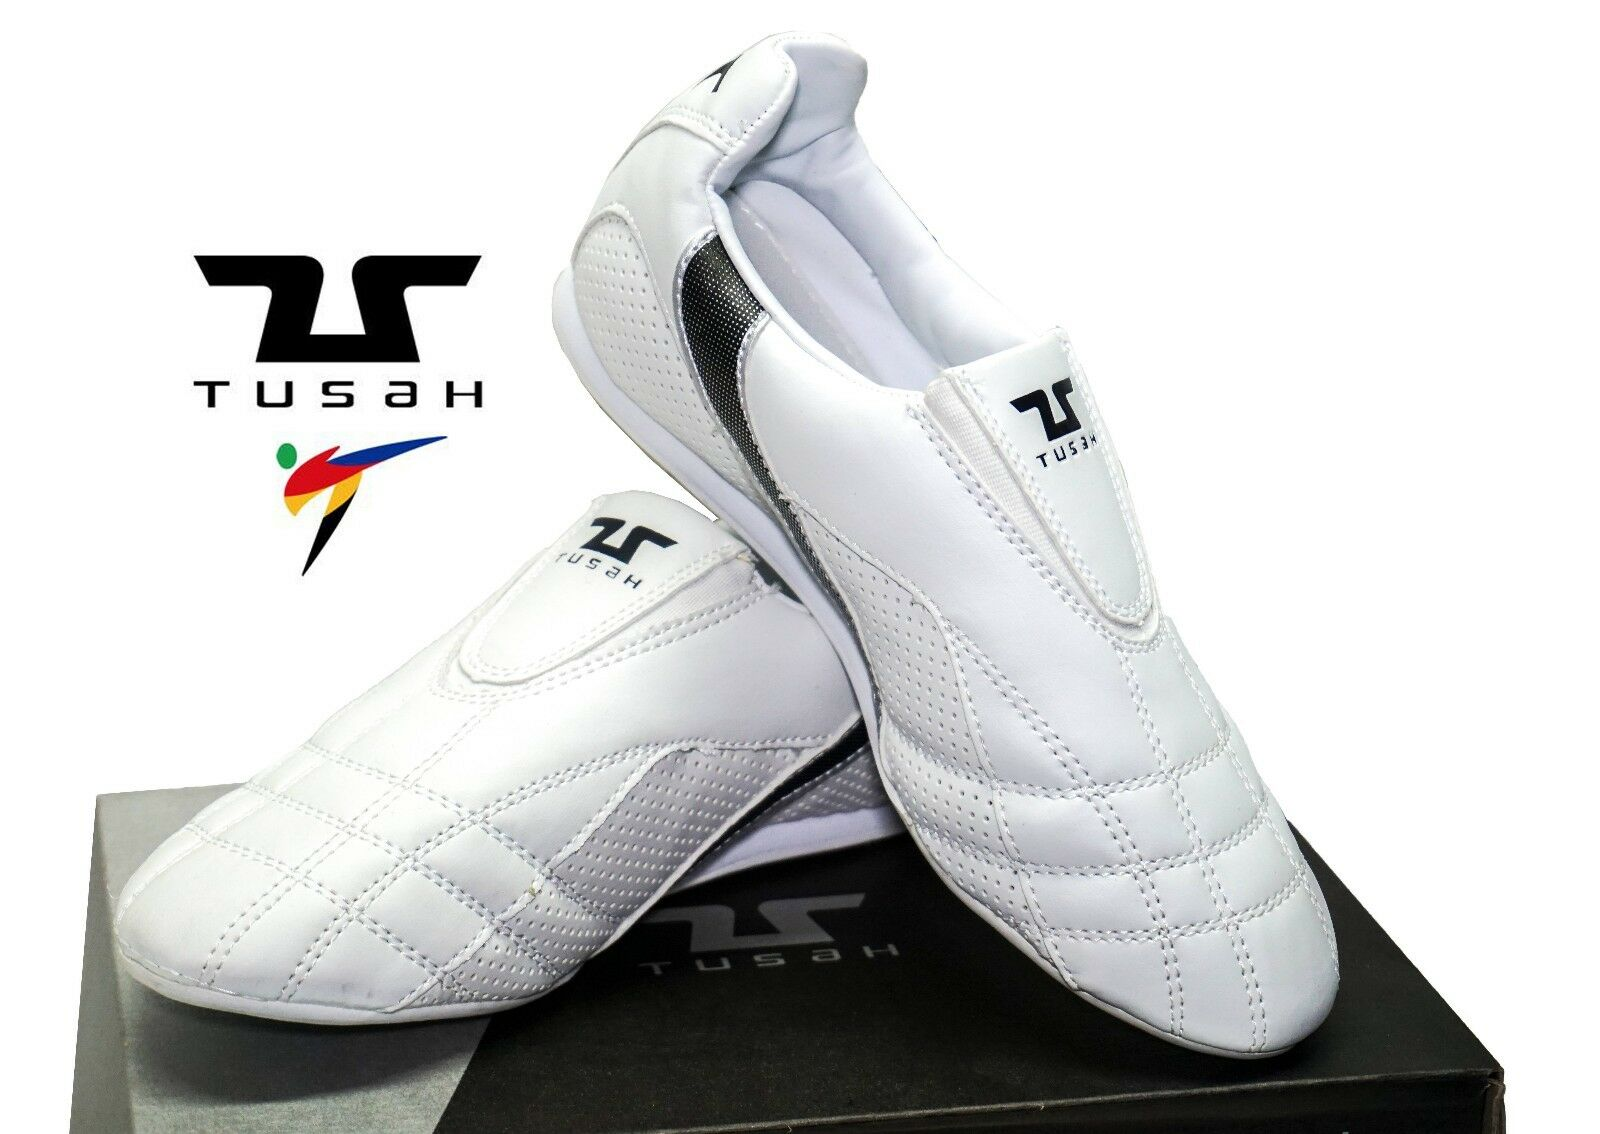 Tusah - Schuhetta Training per Taekwondo, Karate ed Arti Marziali made in Corea